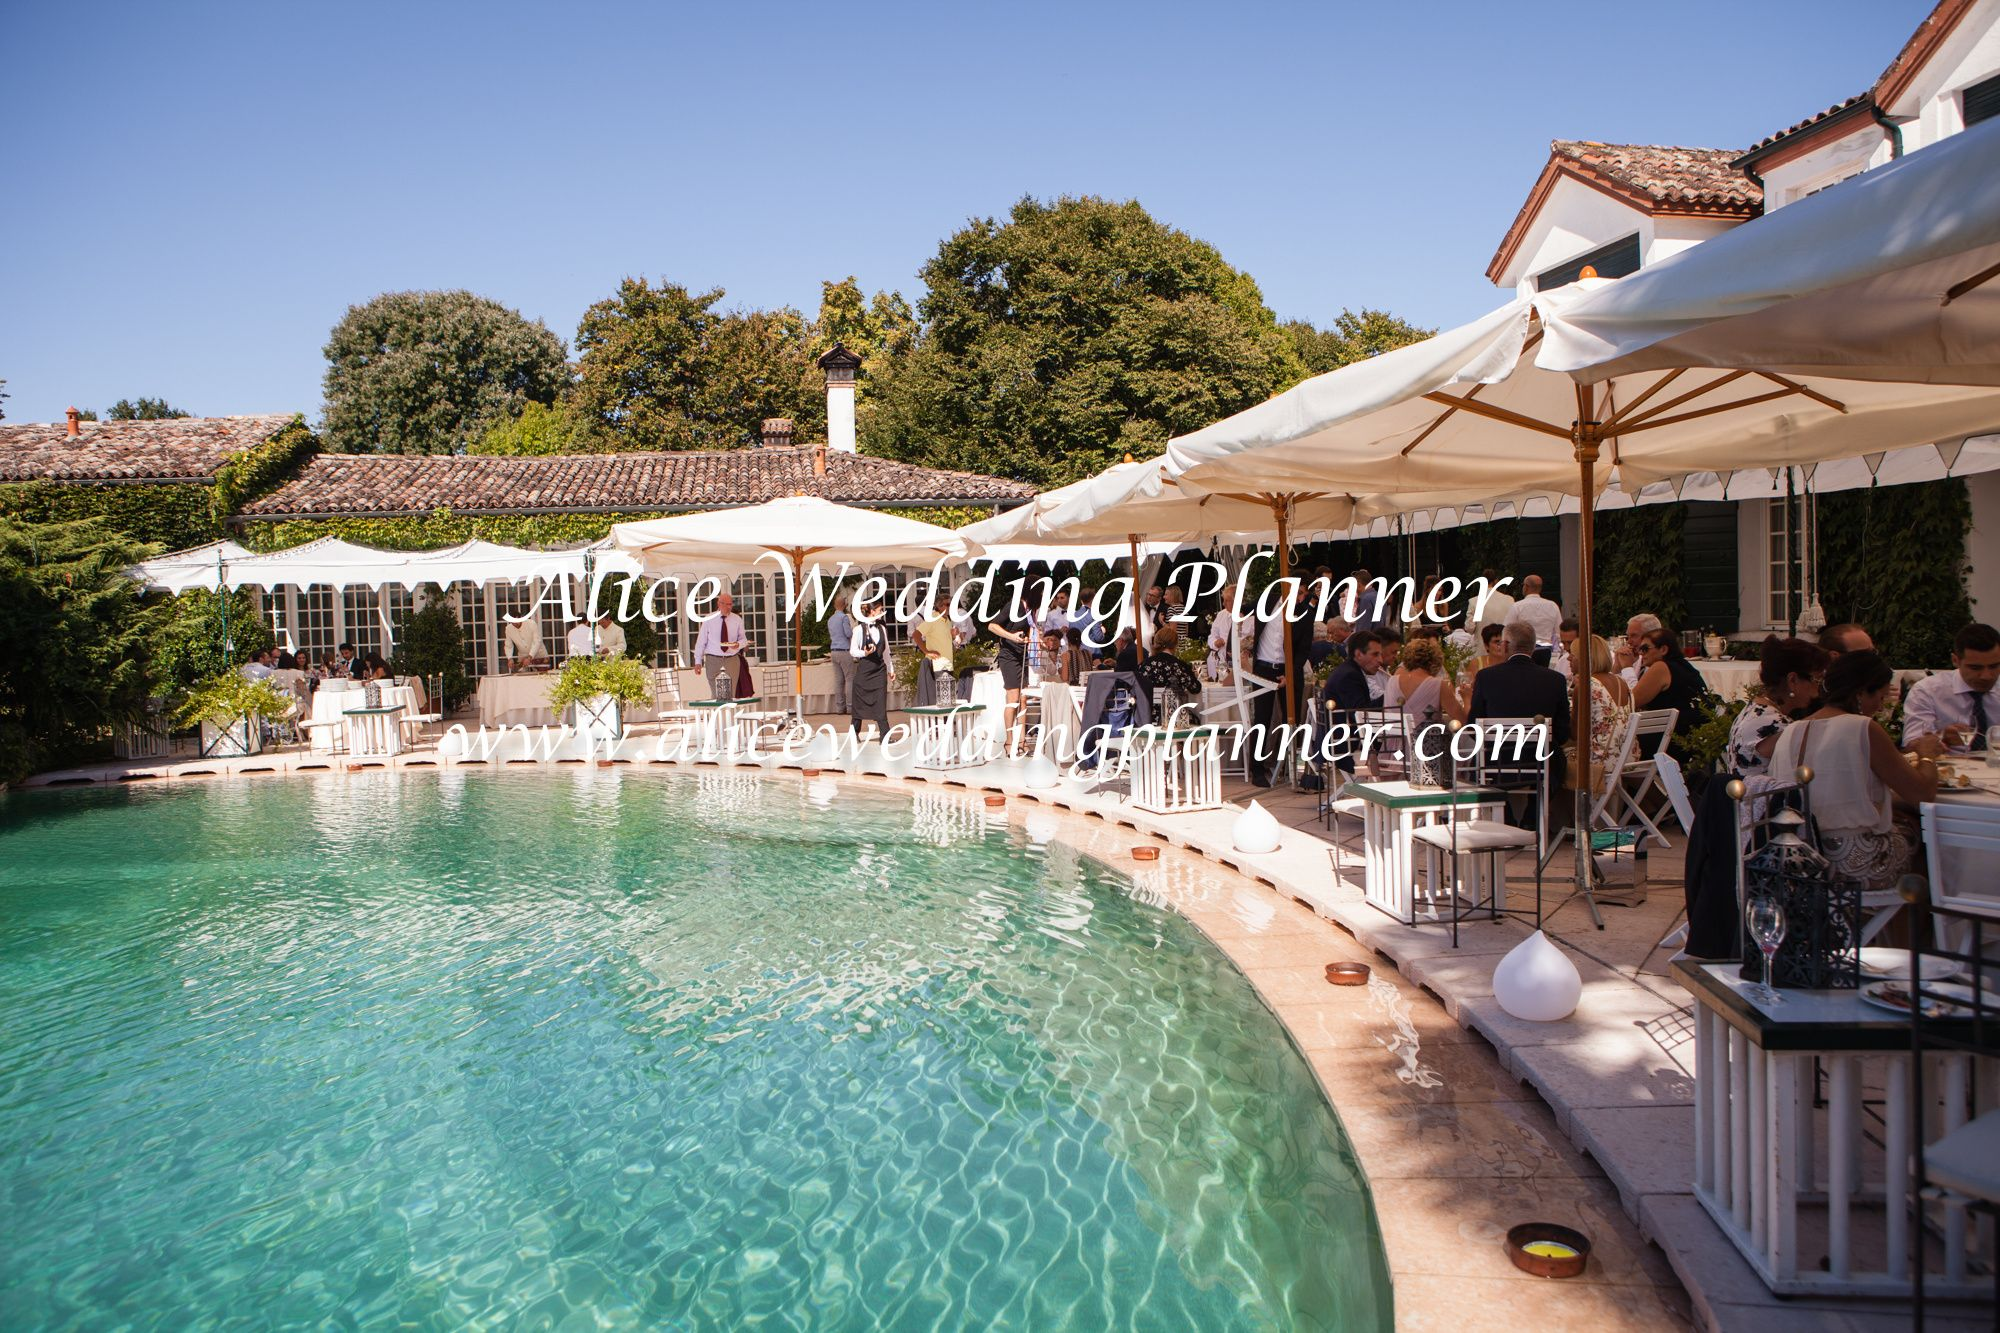 Wedding Location Villa di Campocroce -Mogliano V.to (TV)  www.aliceweddingplanner.com